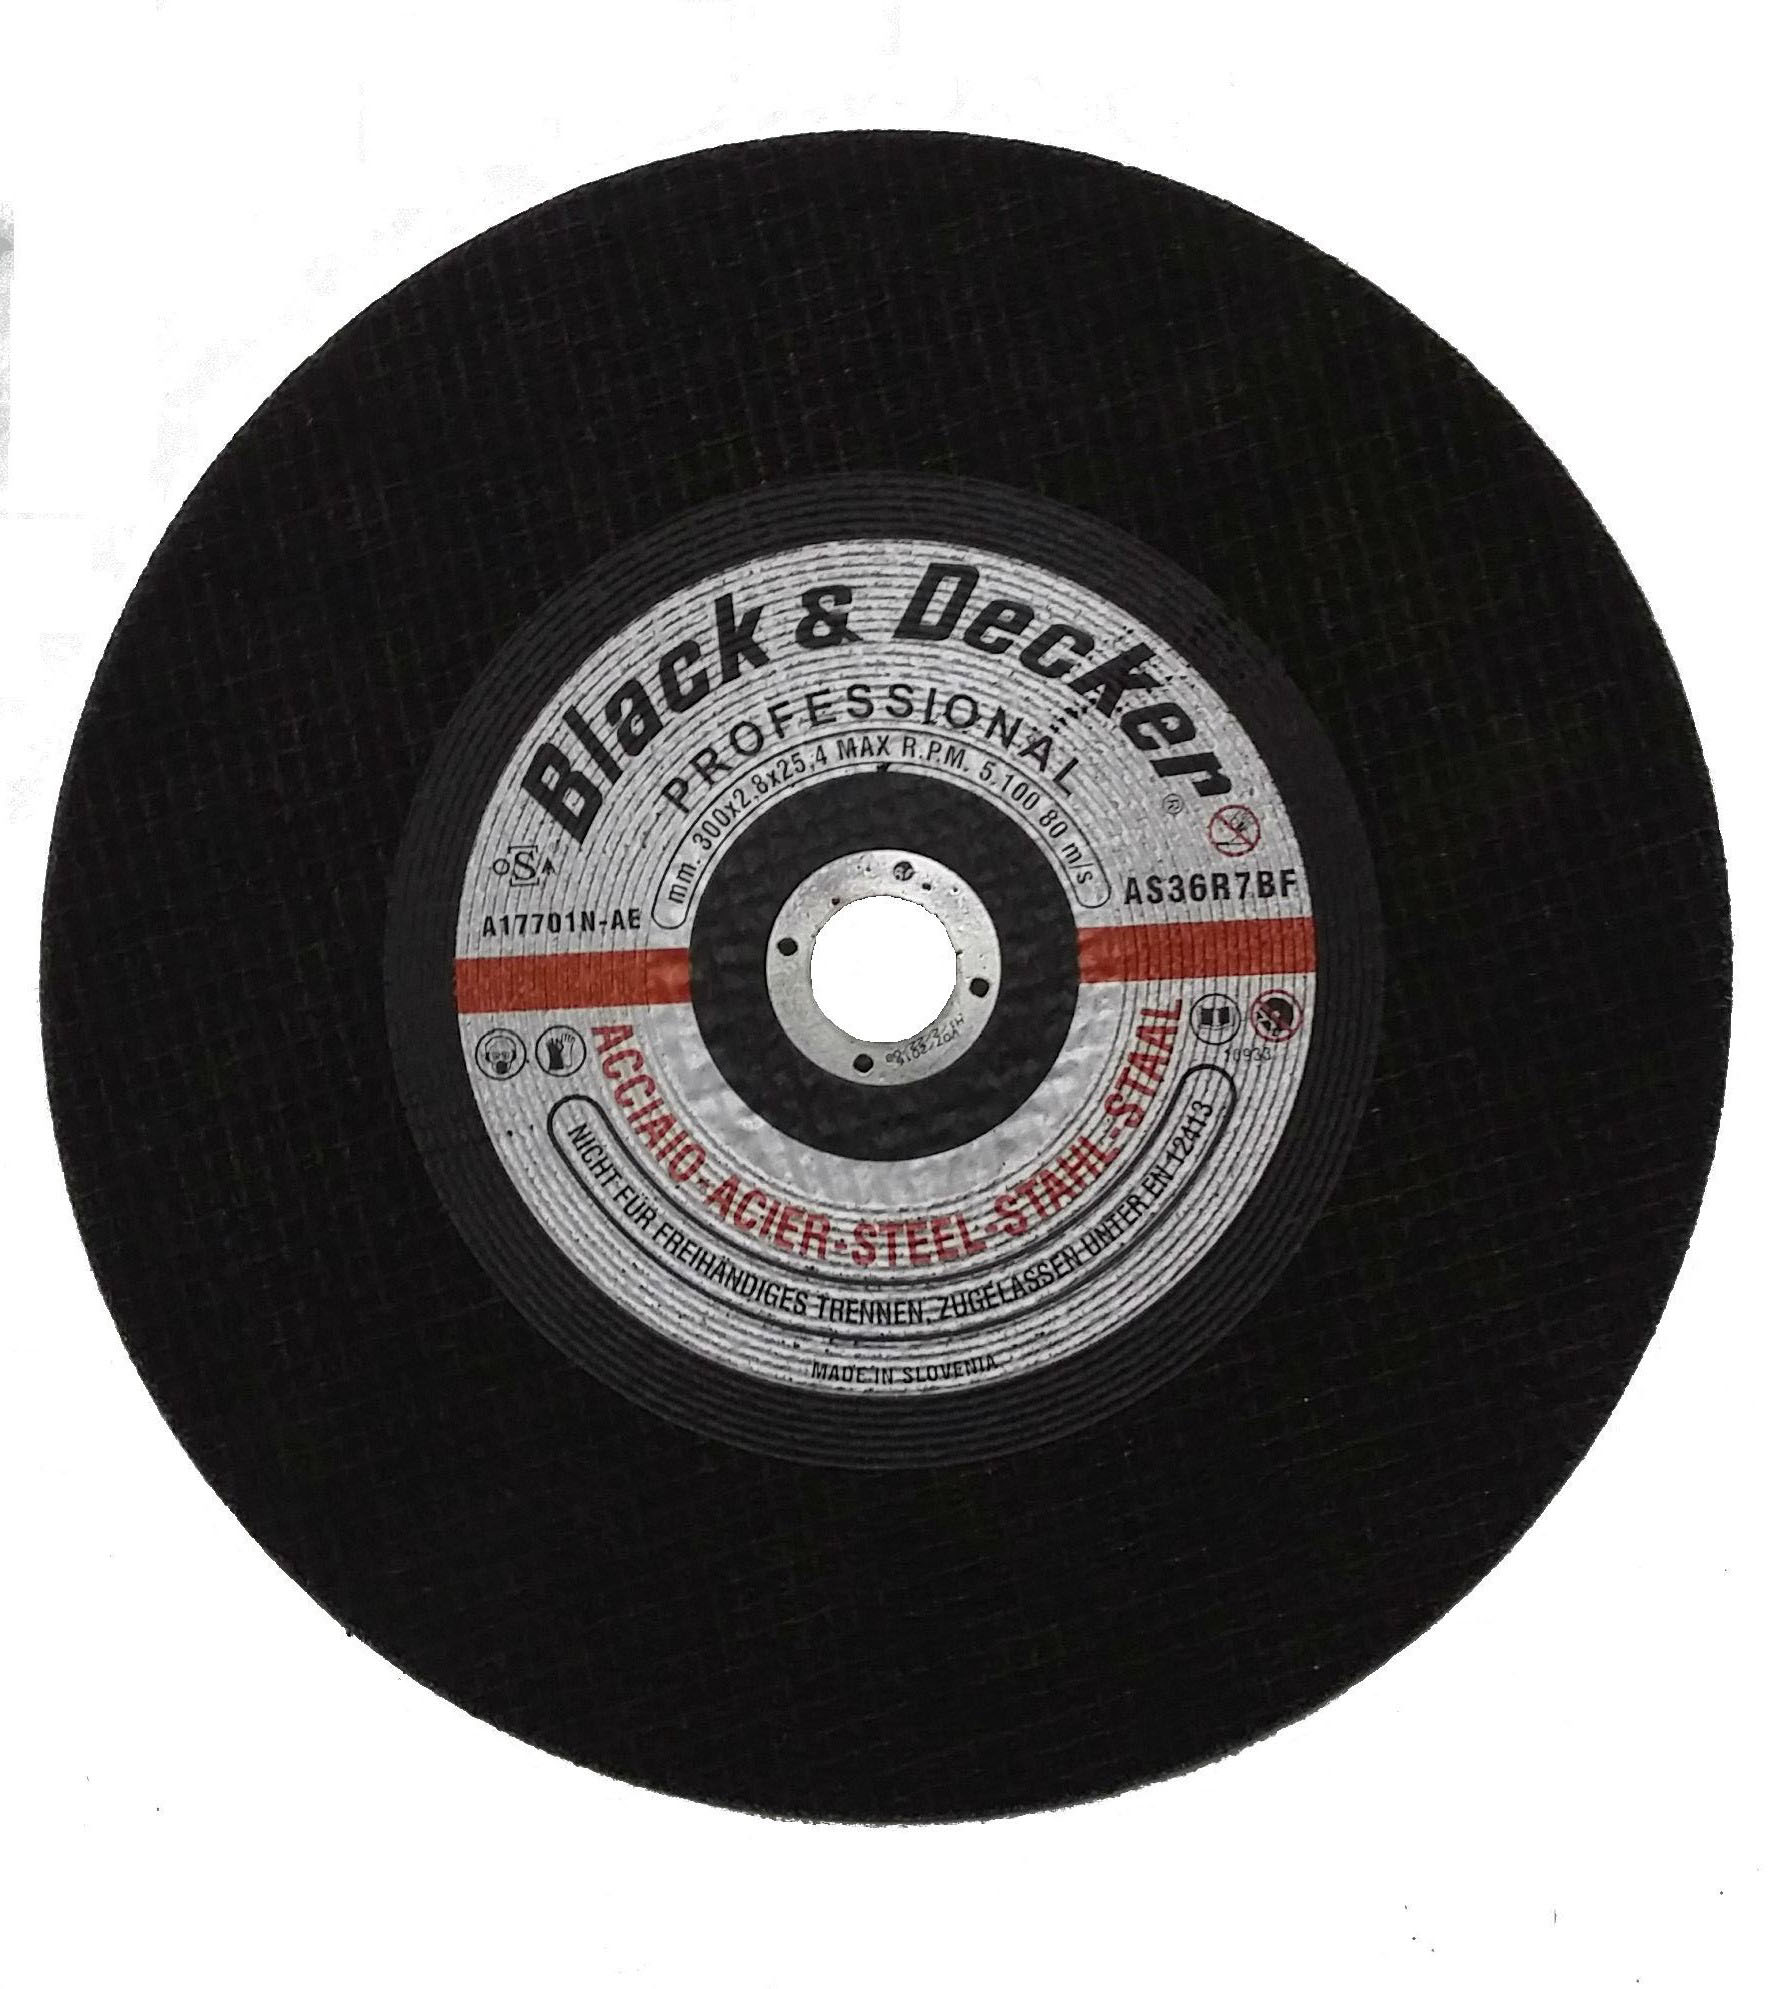 Black & Decker A17701N-AE - 12-inch Metal Cutting Disc